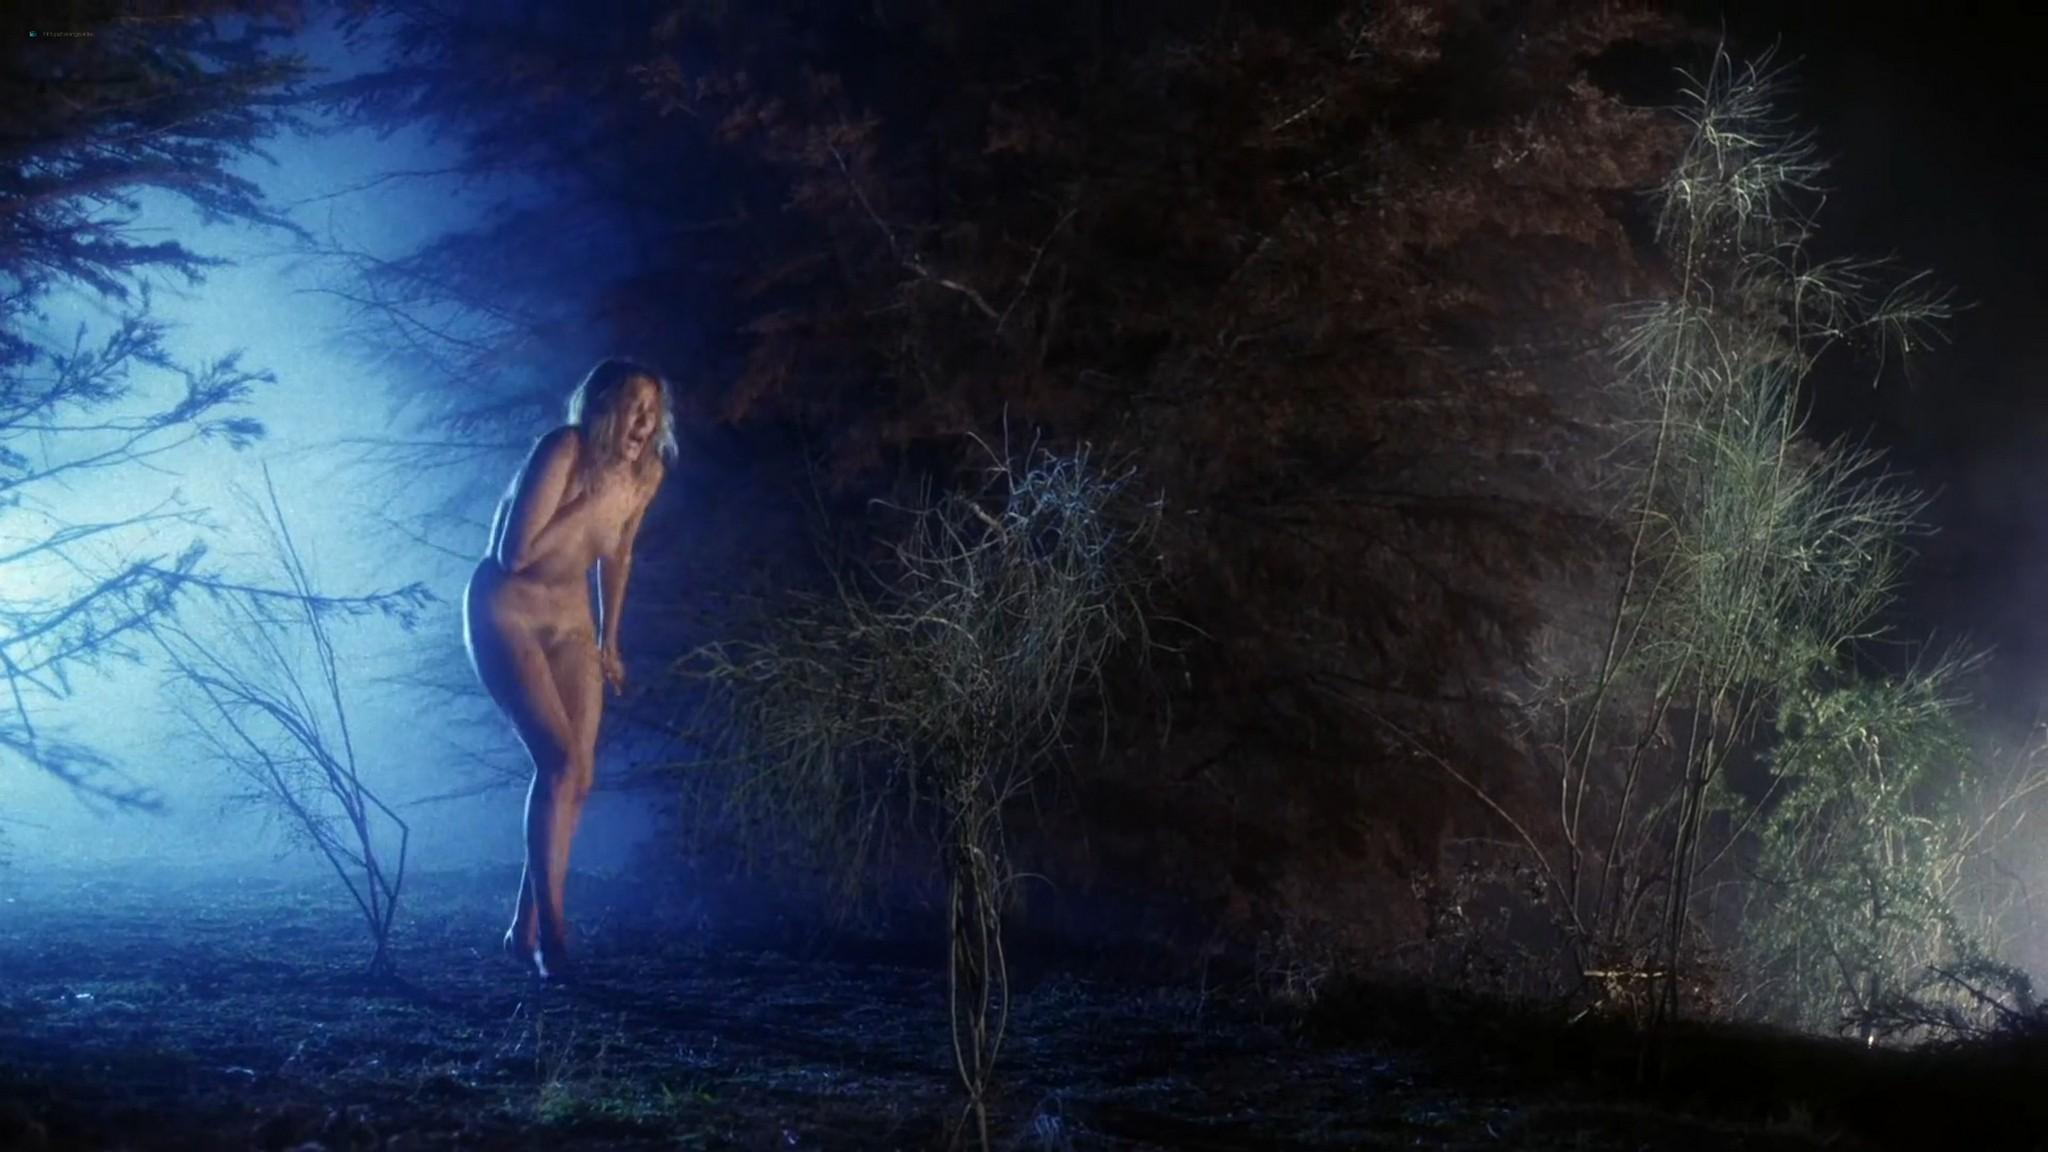 Carole Kirkham nude full frontal Silvia Miro Paquita Ondiviela all nude bush Panic Beats ES 1983 1080p BluRay 2